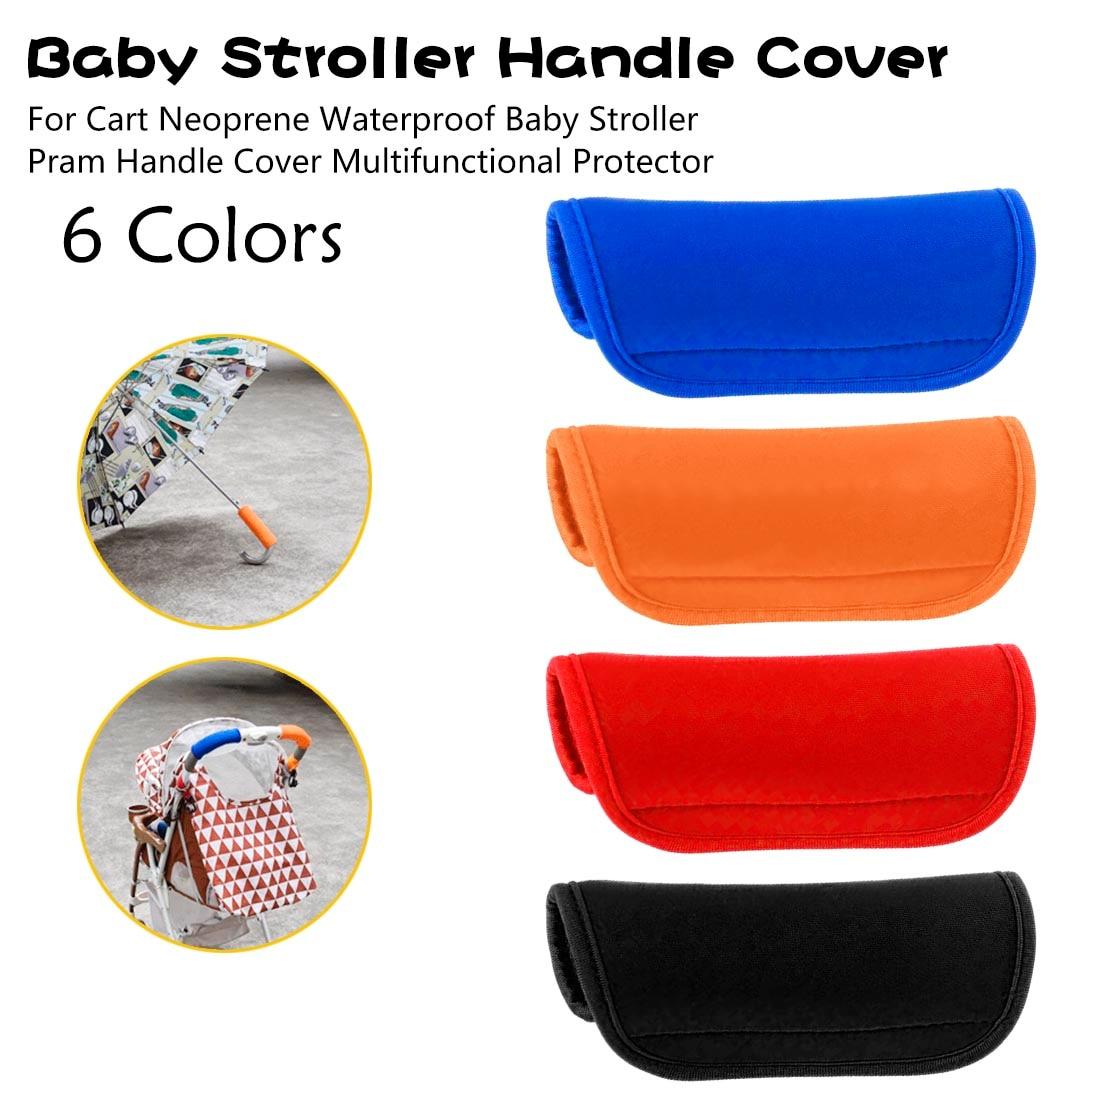 Strollers Armrest Covers Stroller Handle Cover Self-adhesive EVA Foam